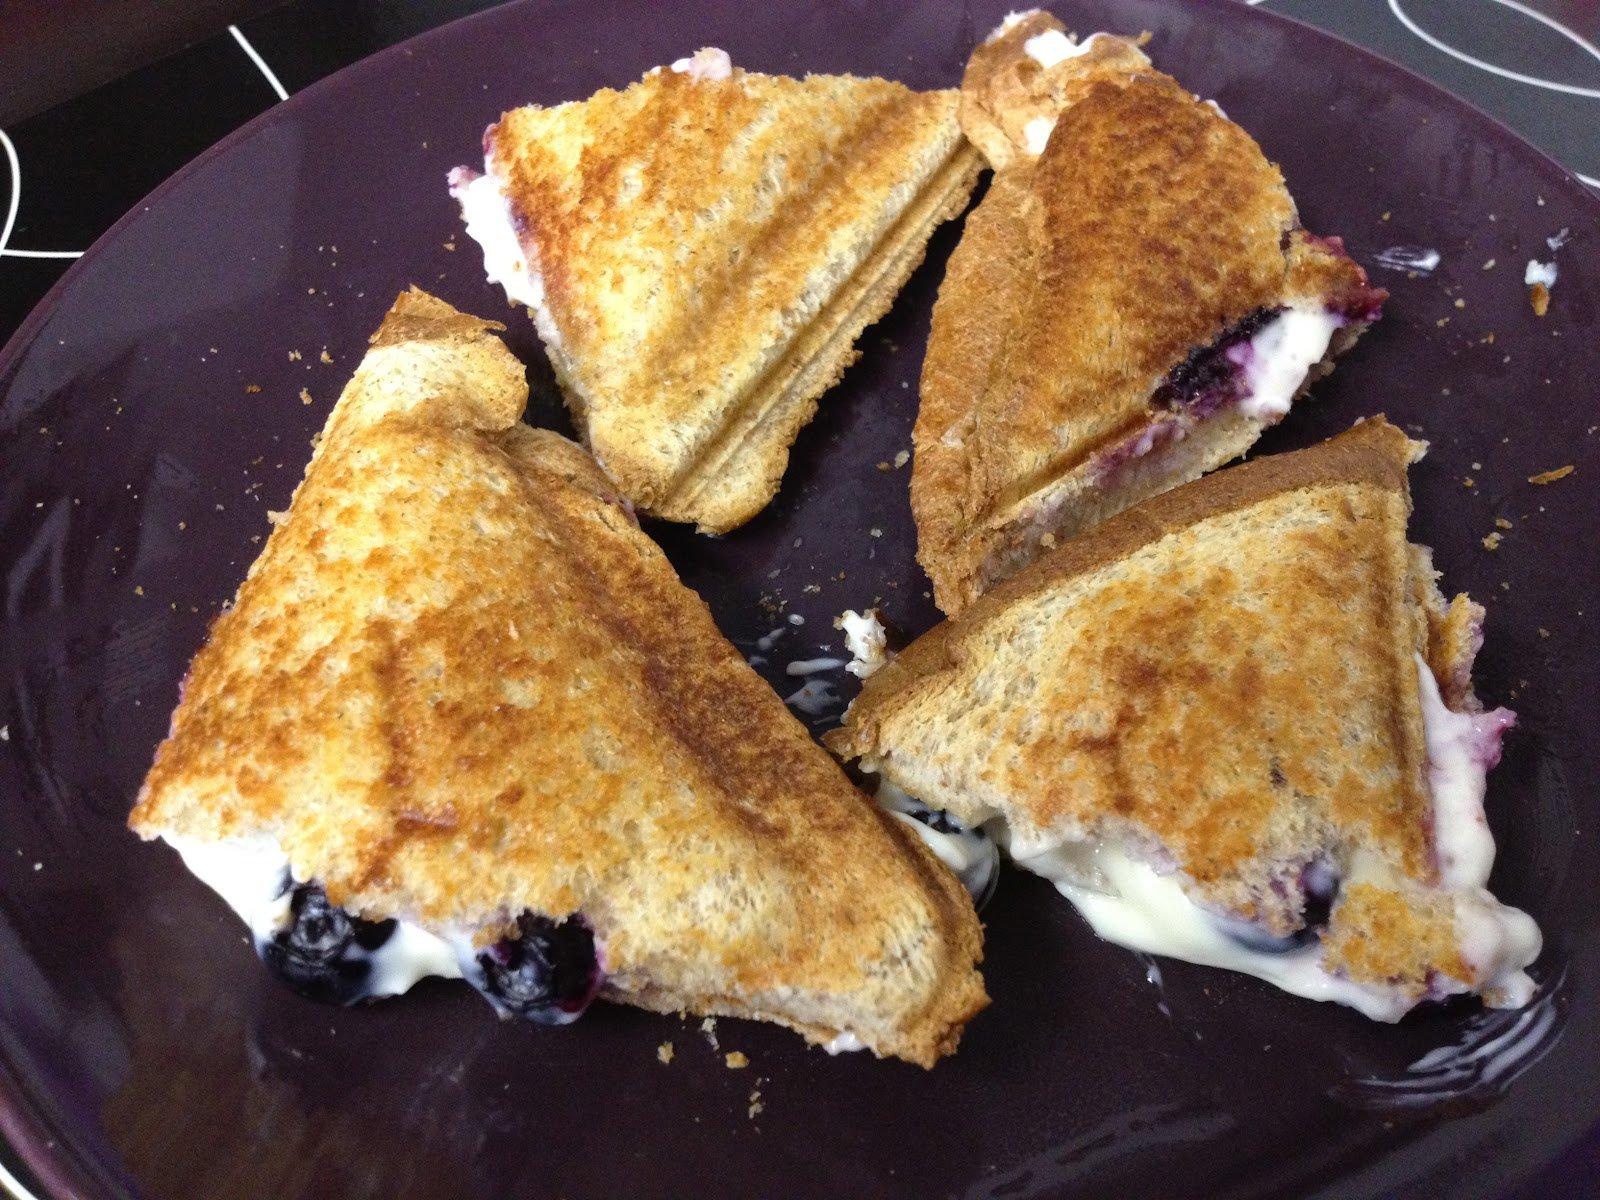 Blueberry breakfast grilled cheese sandwich